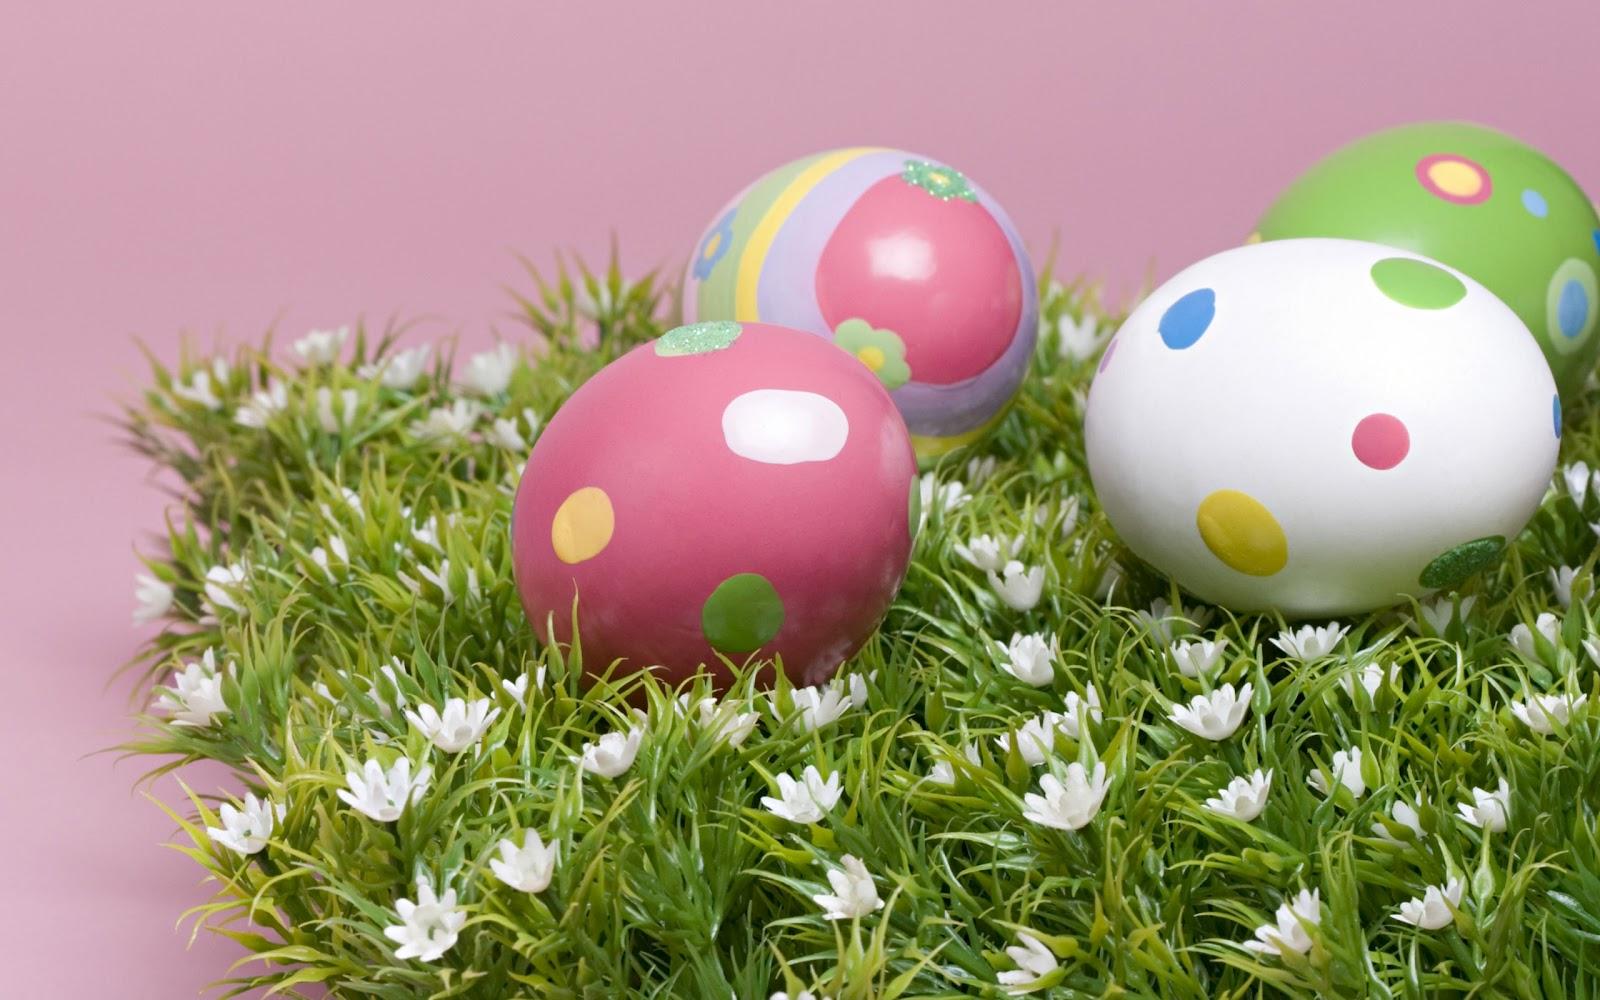 http://3.bp.blogspot.com/-NMaWNFL0PSM/T3noAm3GENI/AAAAAAAABNQ/bIU2EF8kCDw/s1600/Easter_Wallpaper_Eggs_14630.jpg